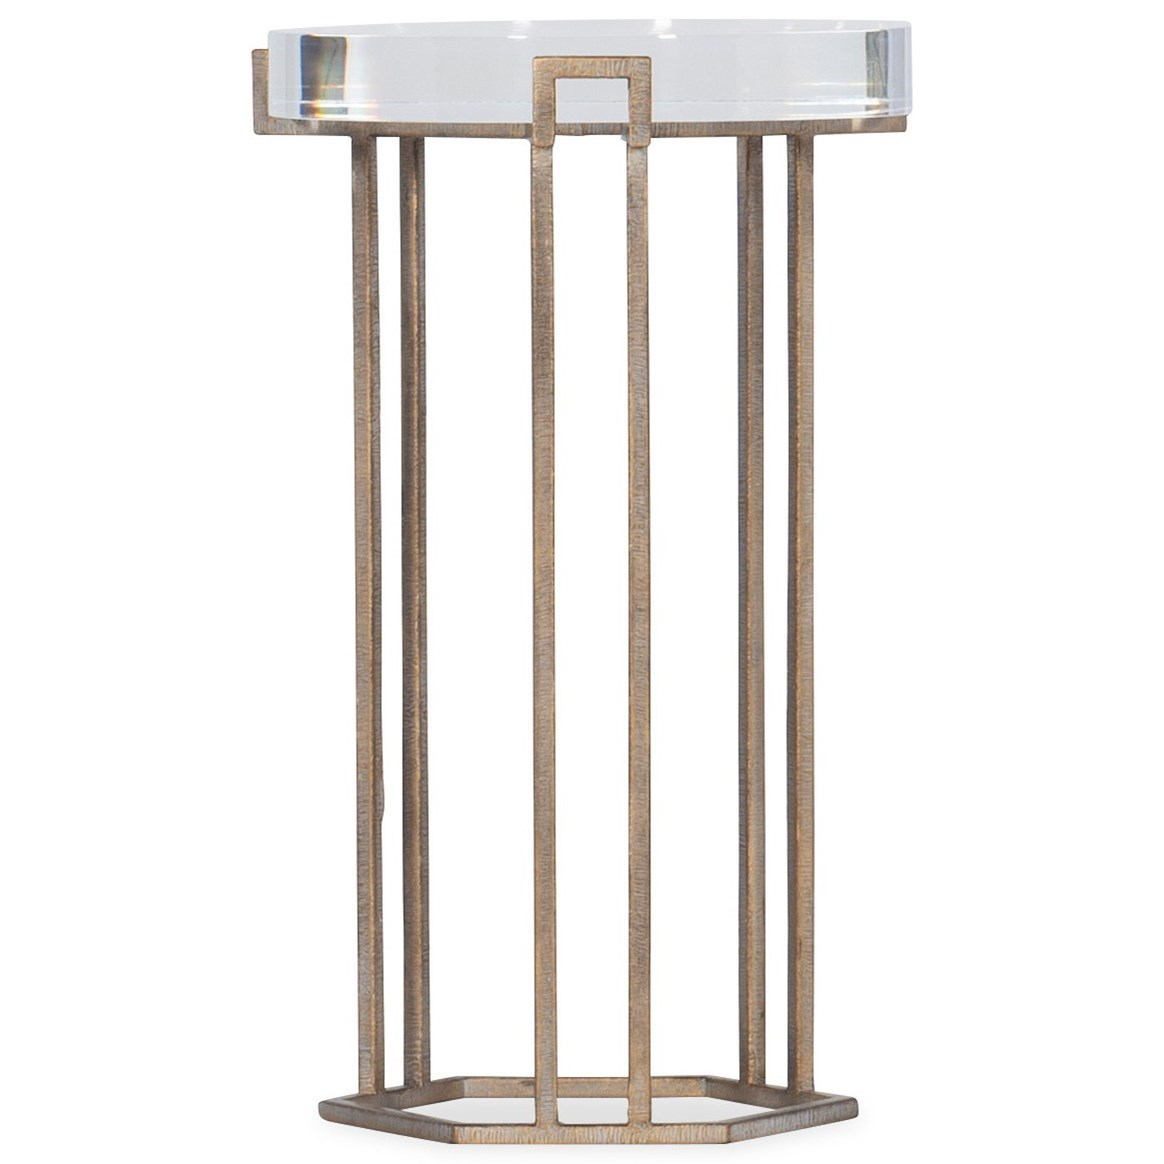 Melange Grove Round End Table by Hooker Furniture at Baer's Furniture